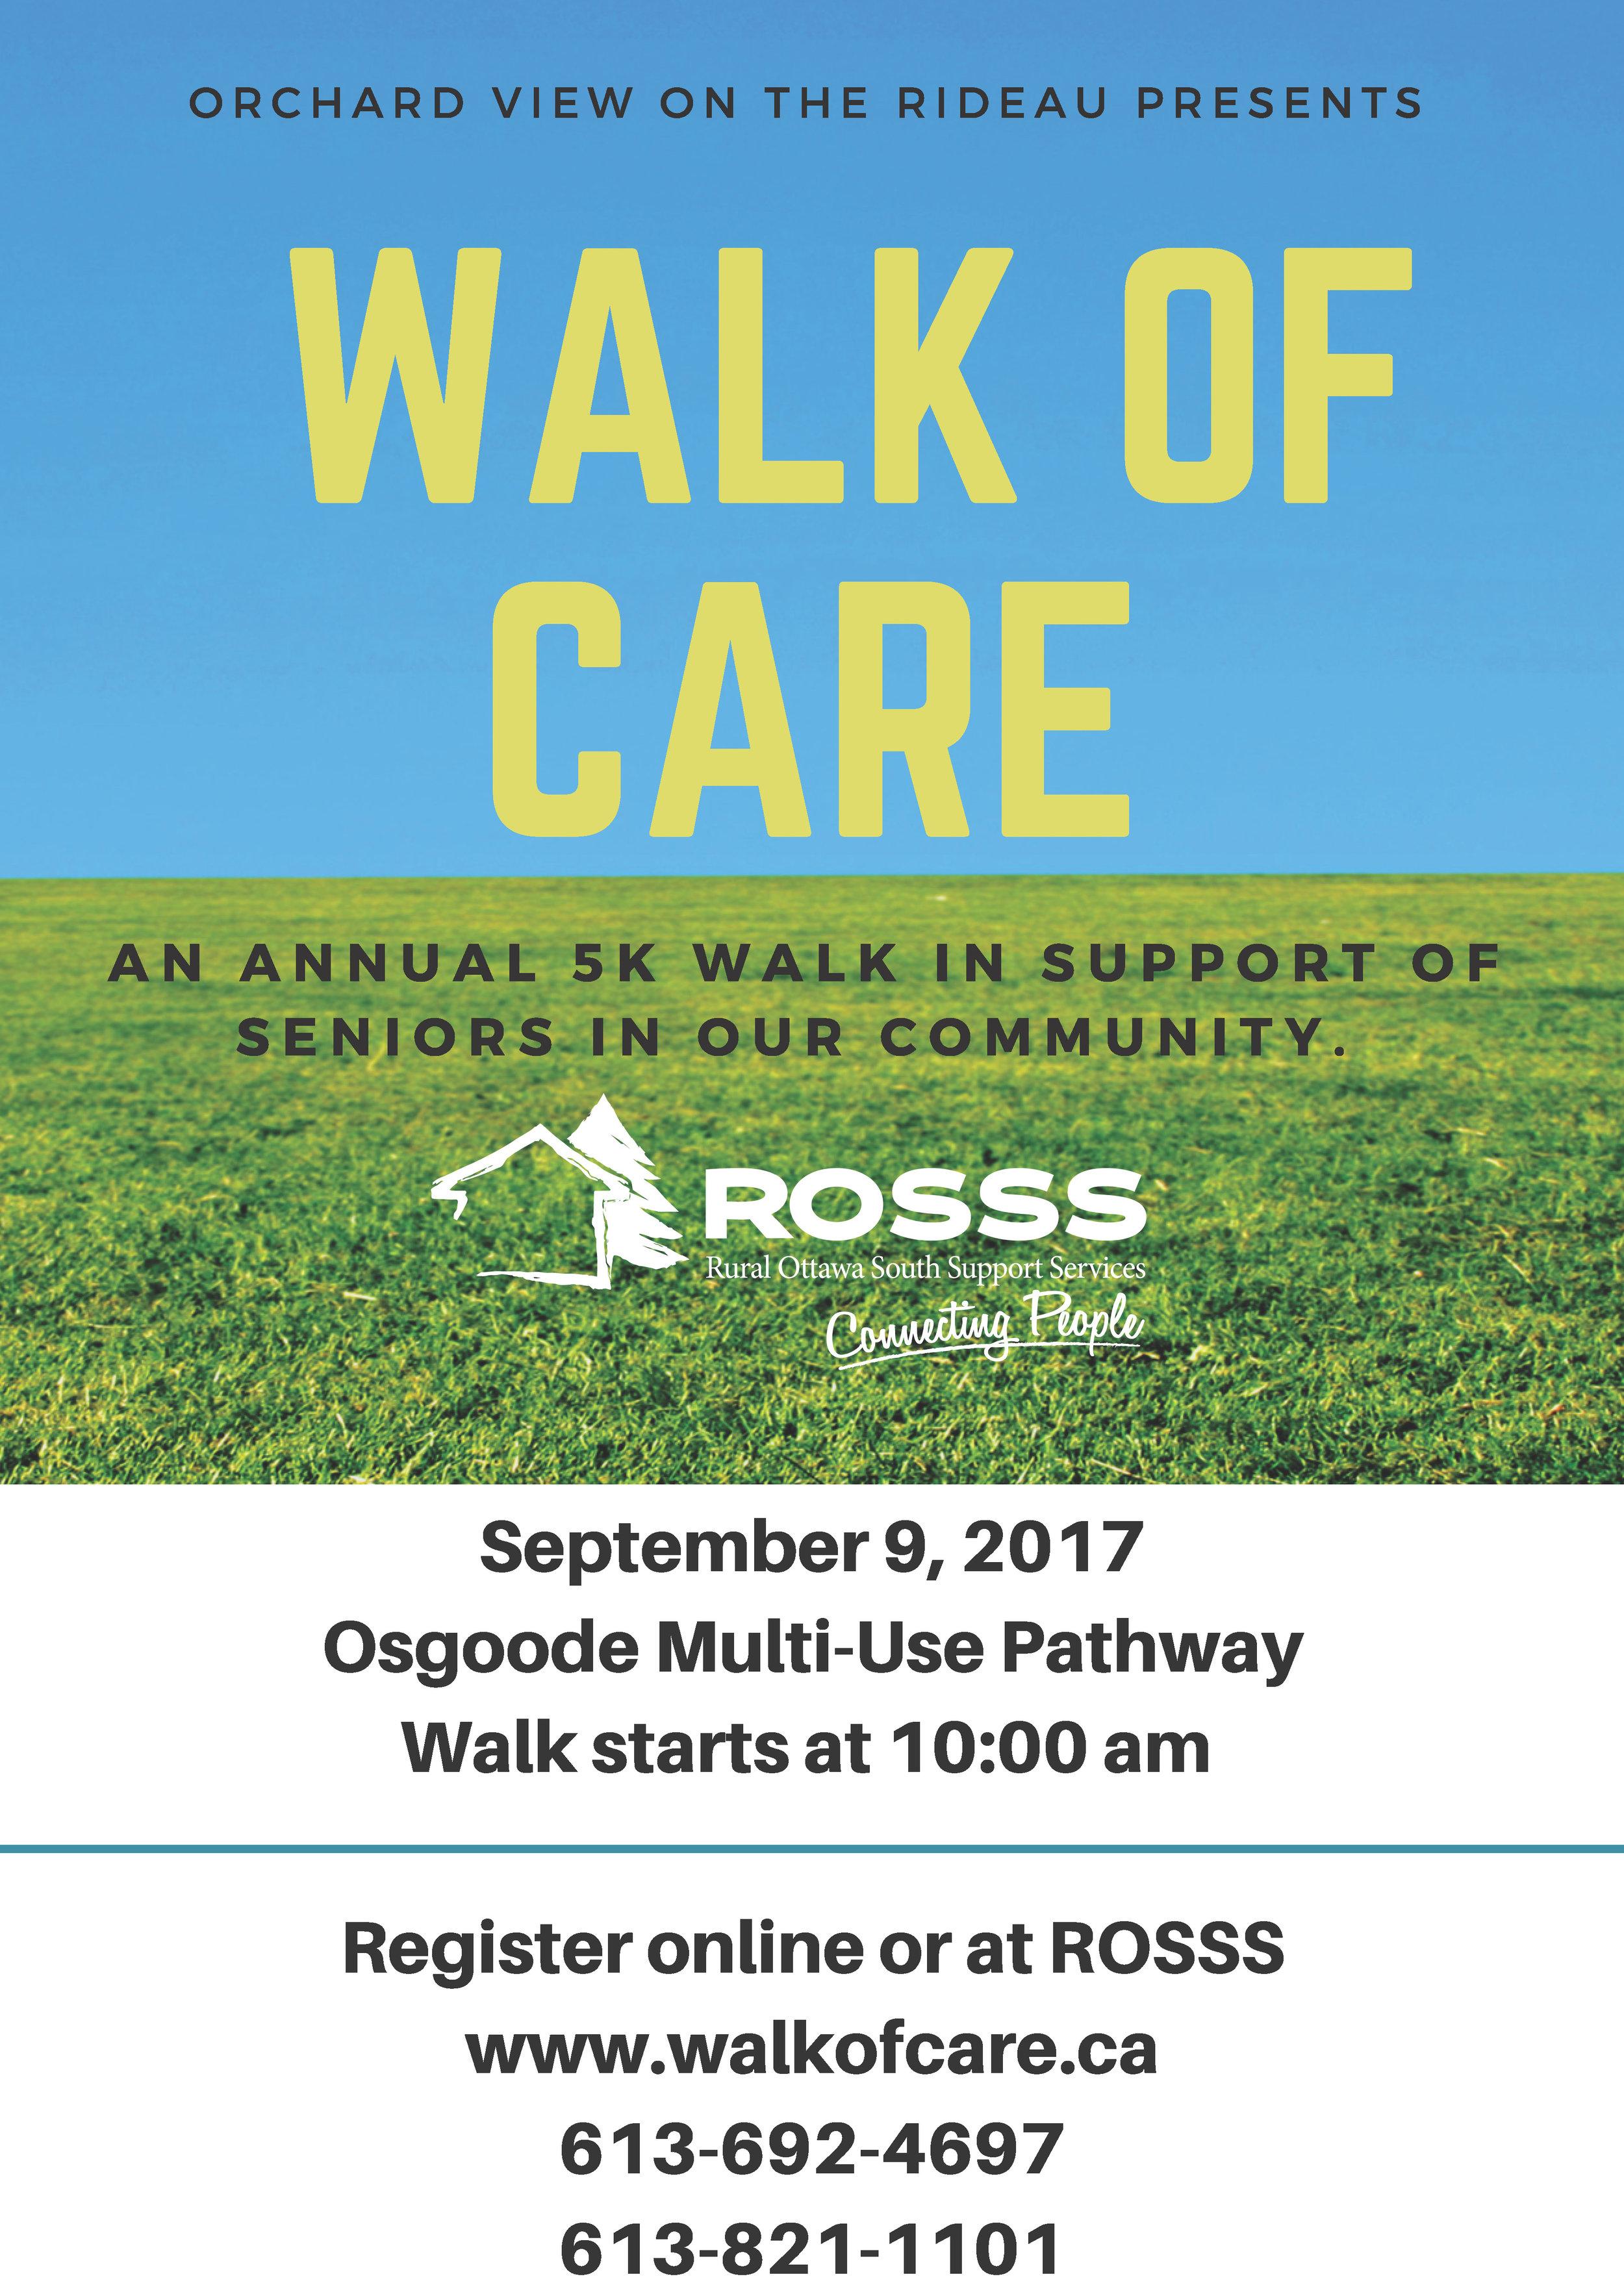 Walk of Care Poster.jpg